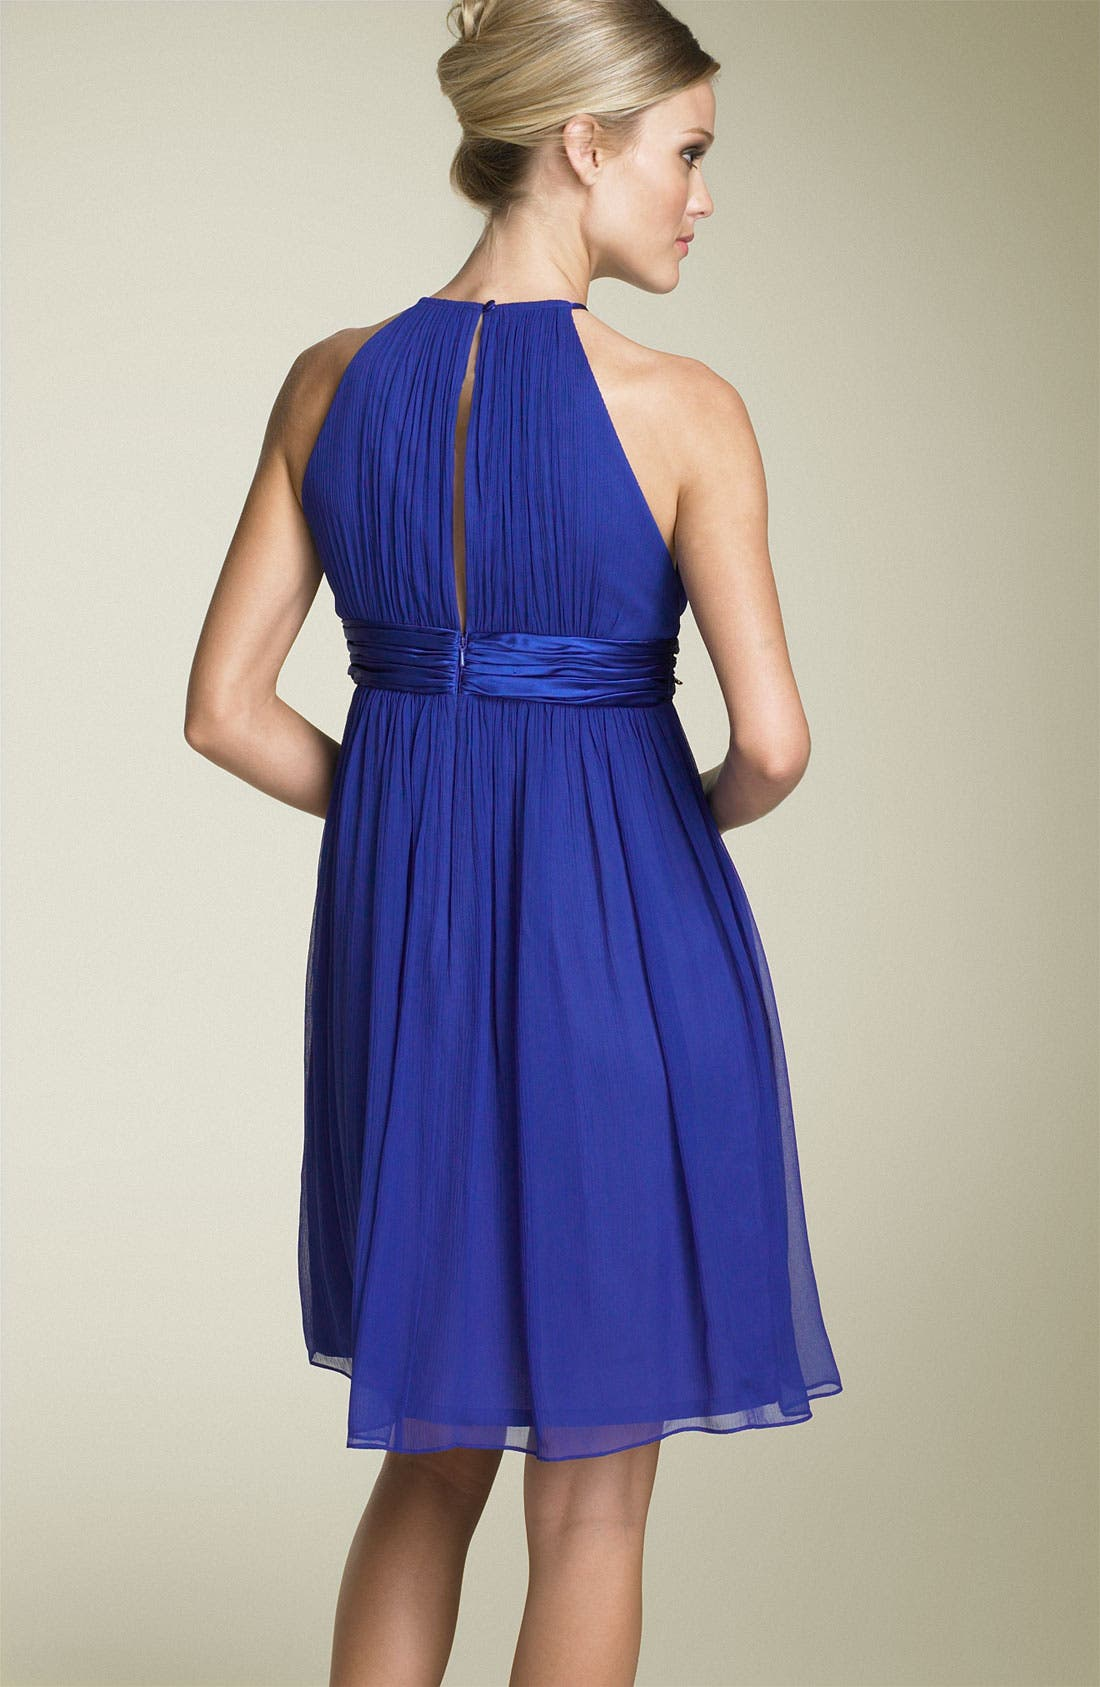 Silk Chiffon Halter Dress,                             Alternate thumbnail 2, color,                             Tile Blue